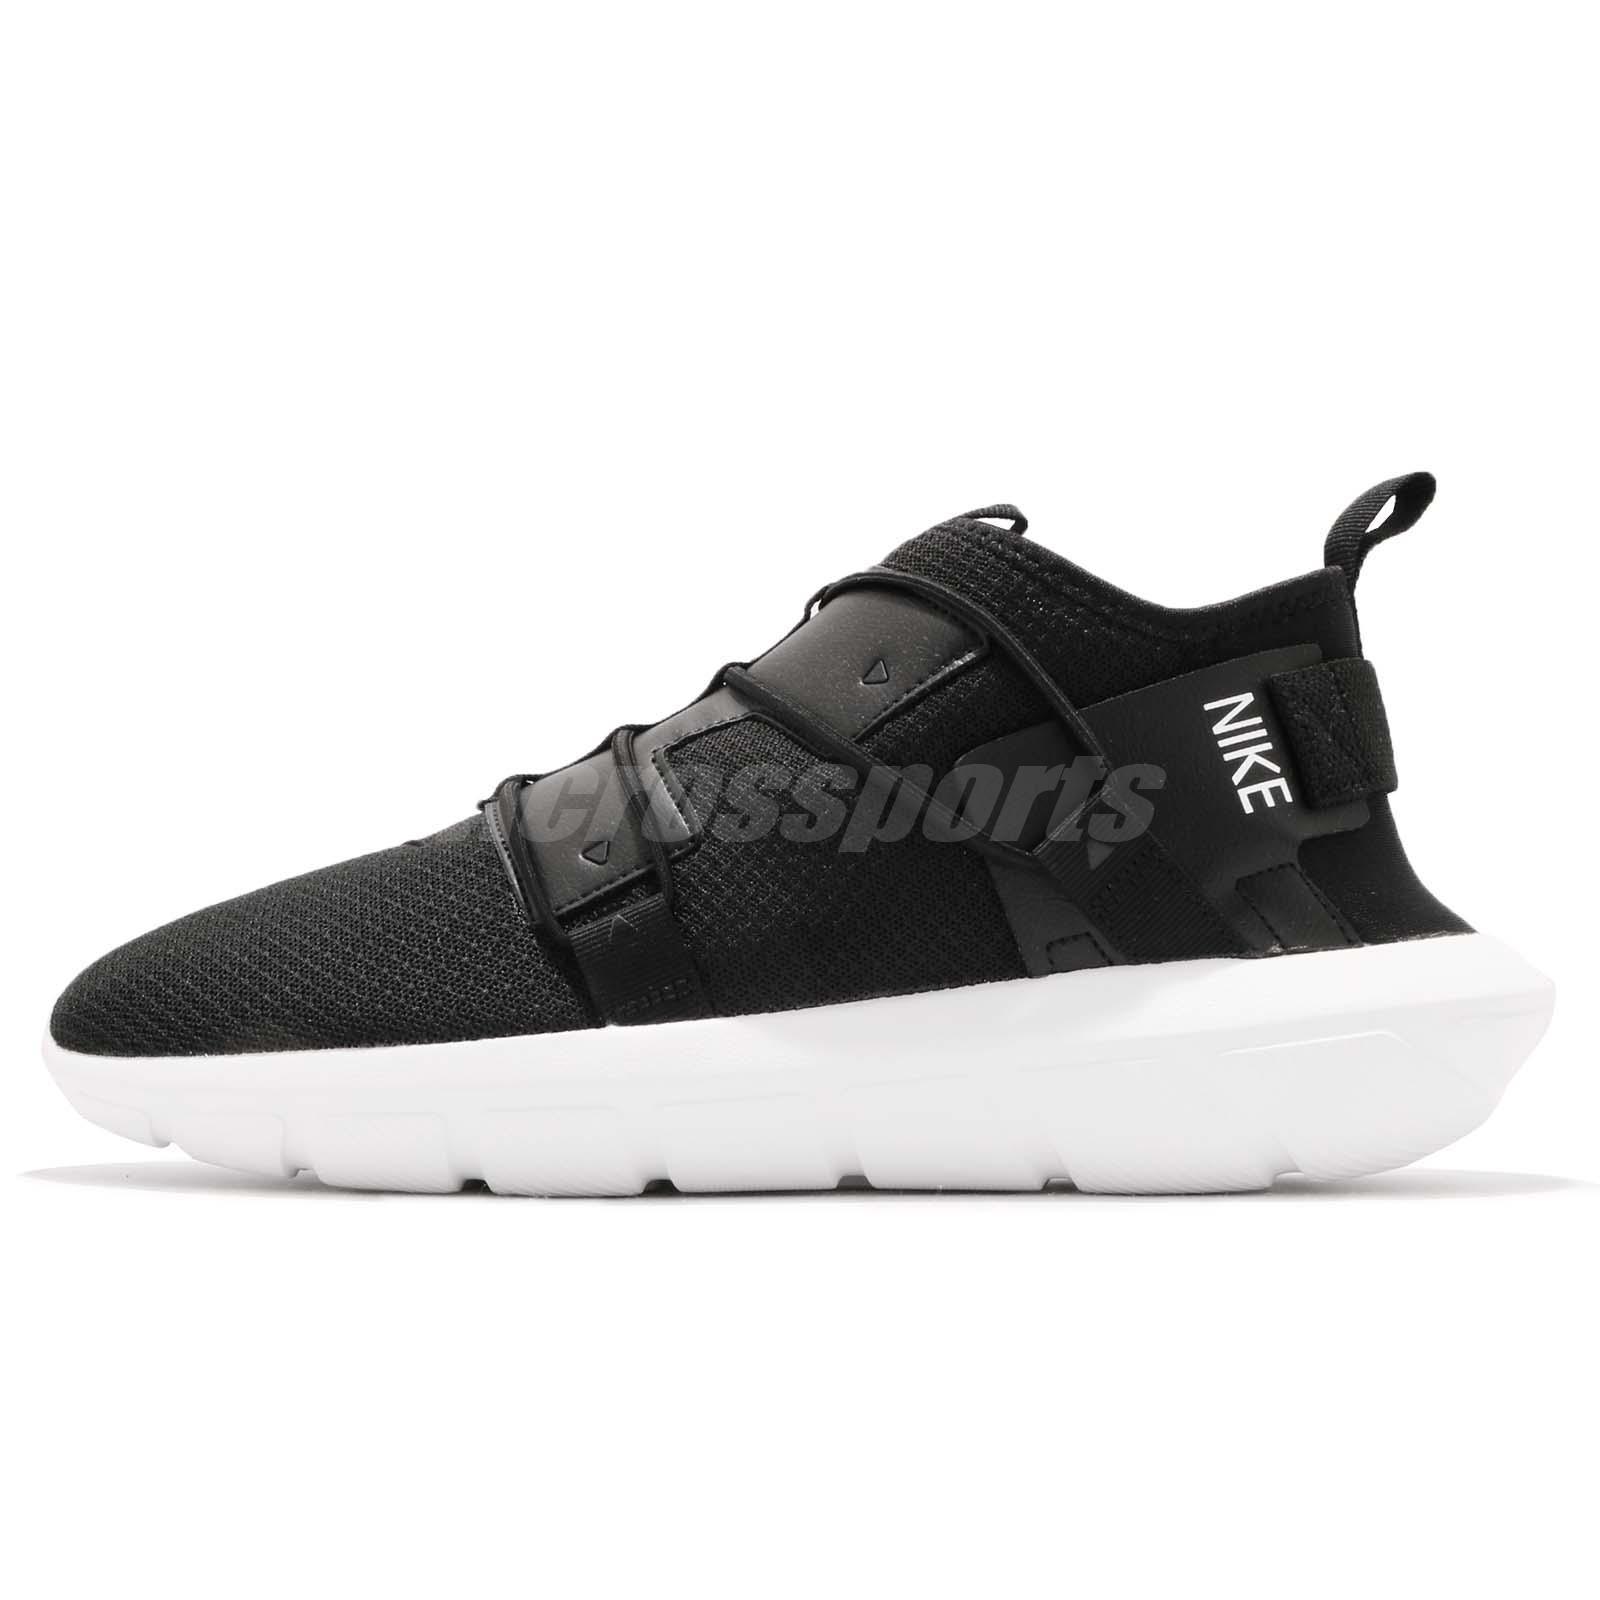 fbbc8295b3df ... Nike Vortak Black White Laceless Mens Casual Shoes Lifestyle